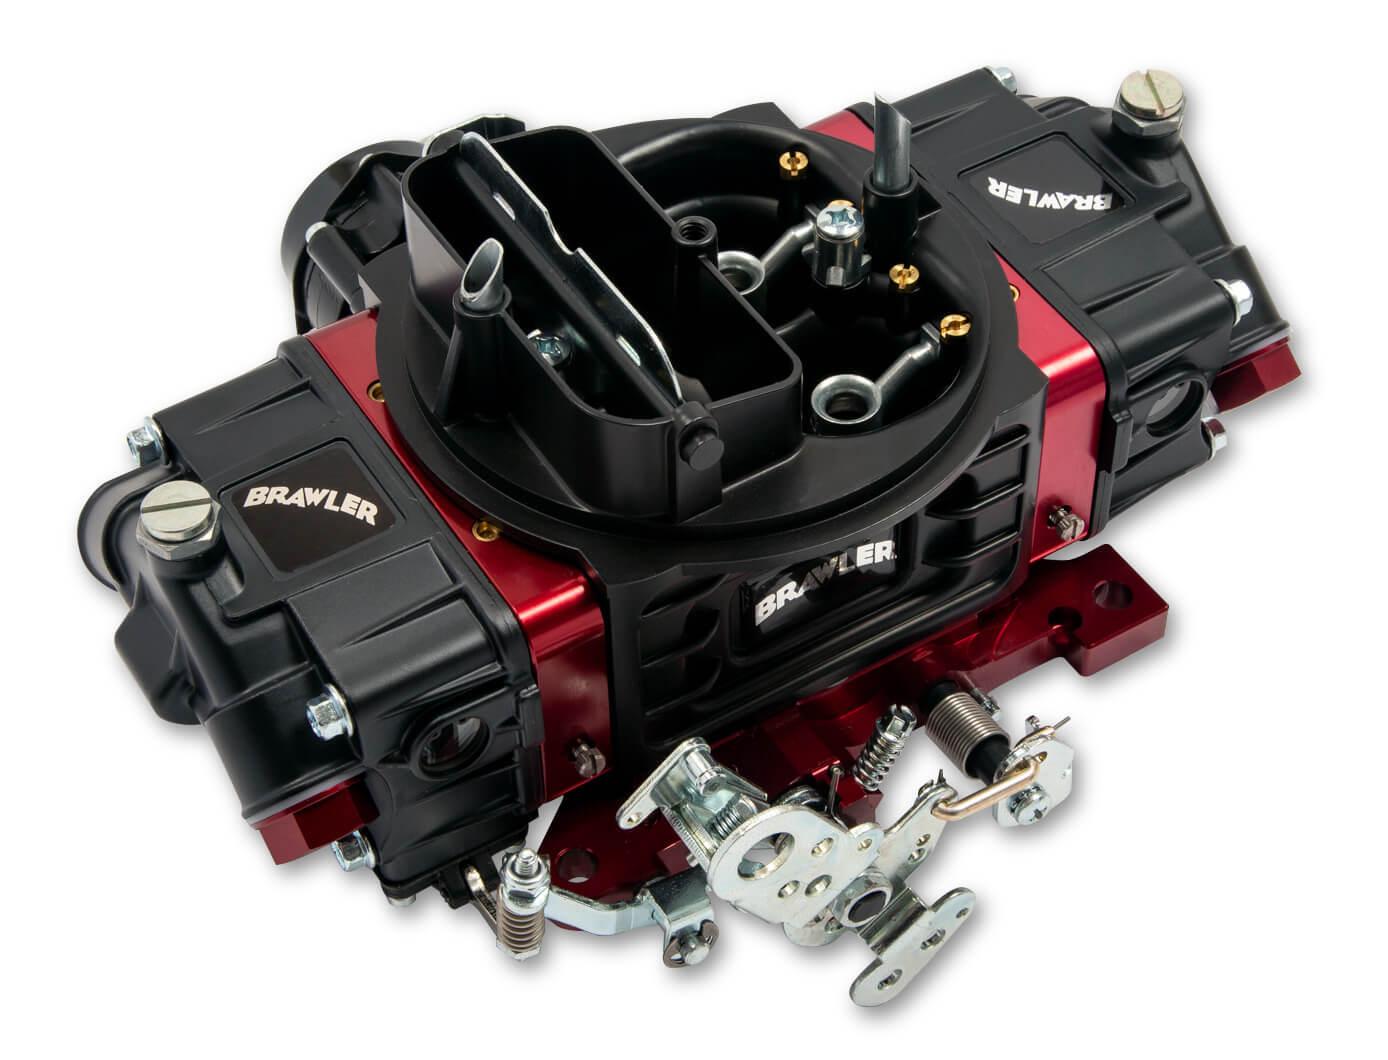 Quick Fuel Technology BR-67320 Carburetor, Brawler Street, 4-Barrel, 750 CFM, Square Bore, Electric Choke, Mechanical Secondary, Dual Inlet, Black Anodized, Each